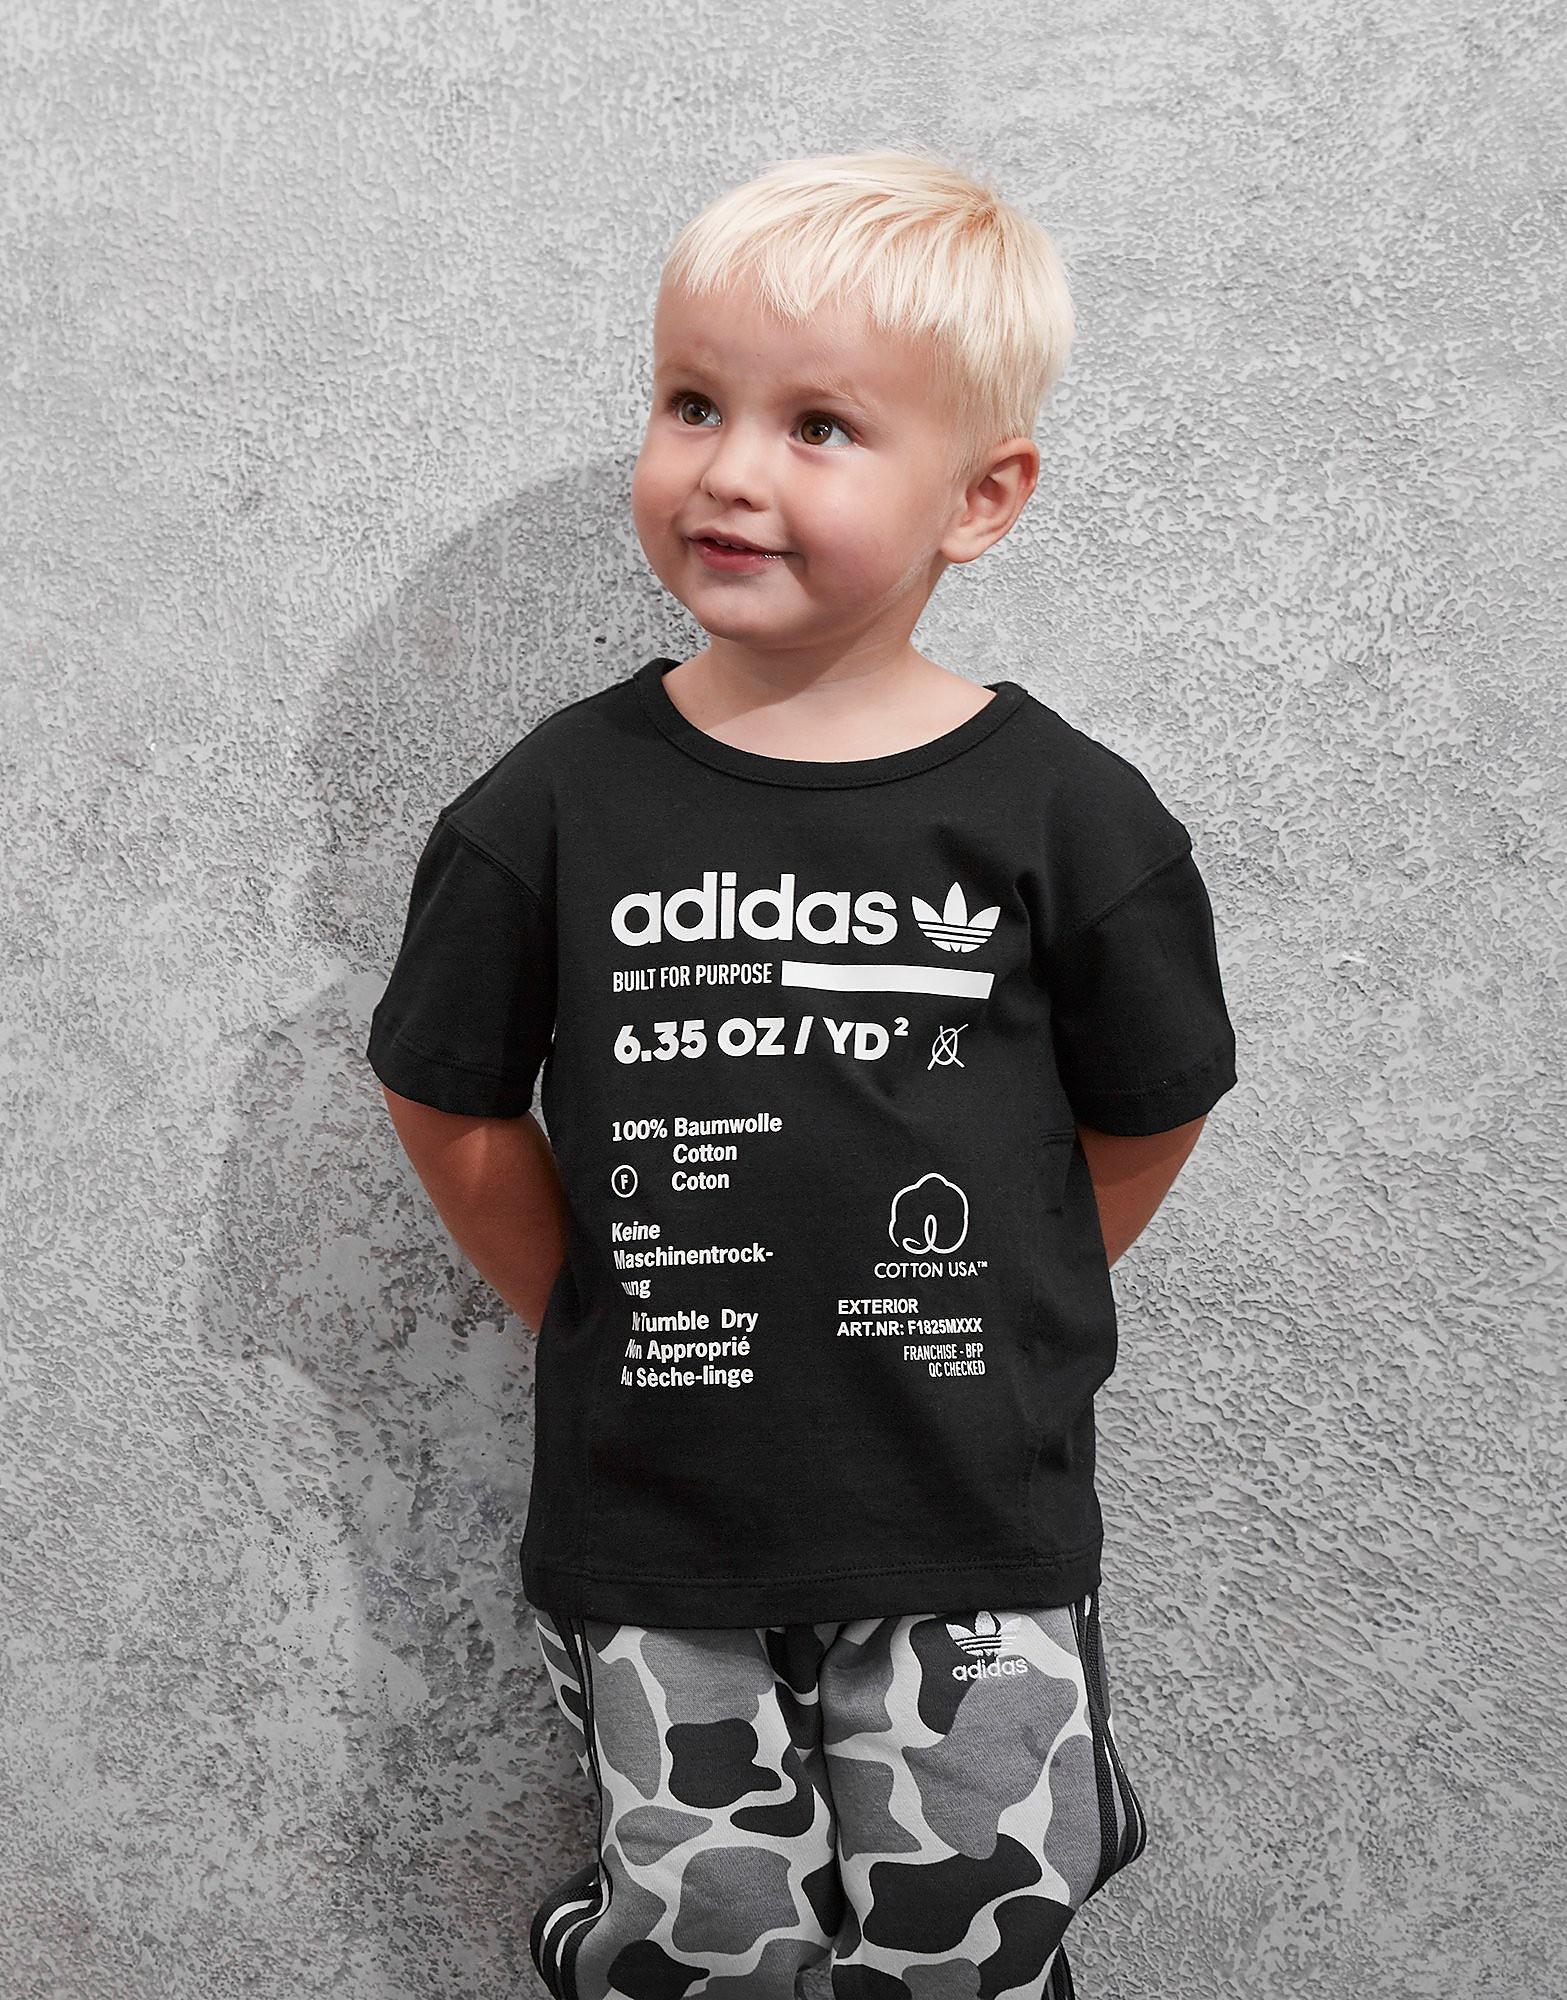 adidas Originals Kaval T-Shirt Baby's - Zwart - Kind